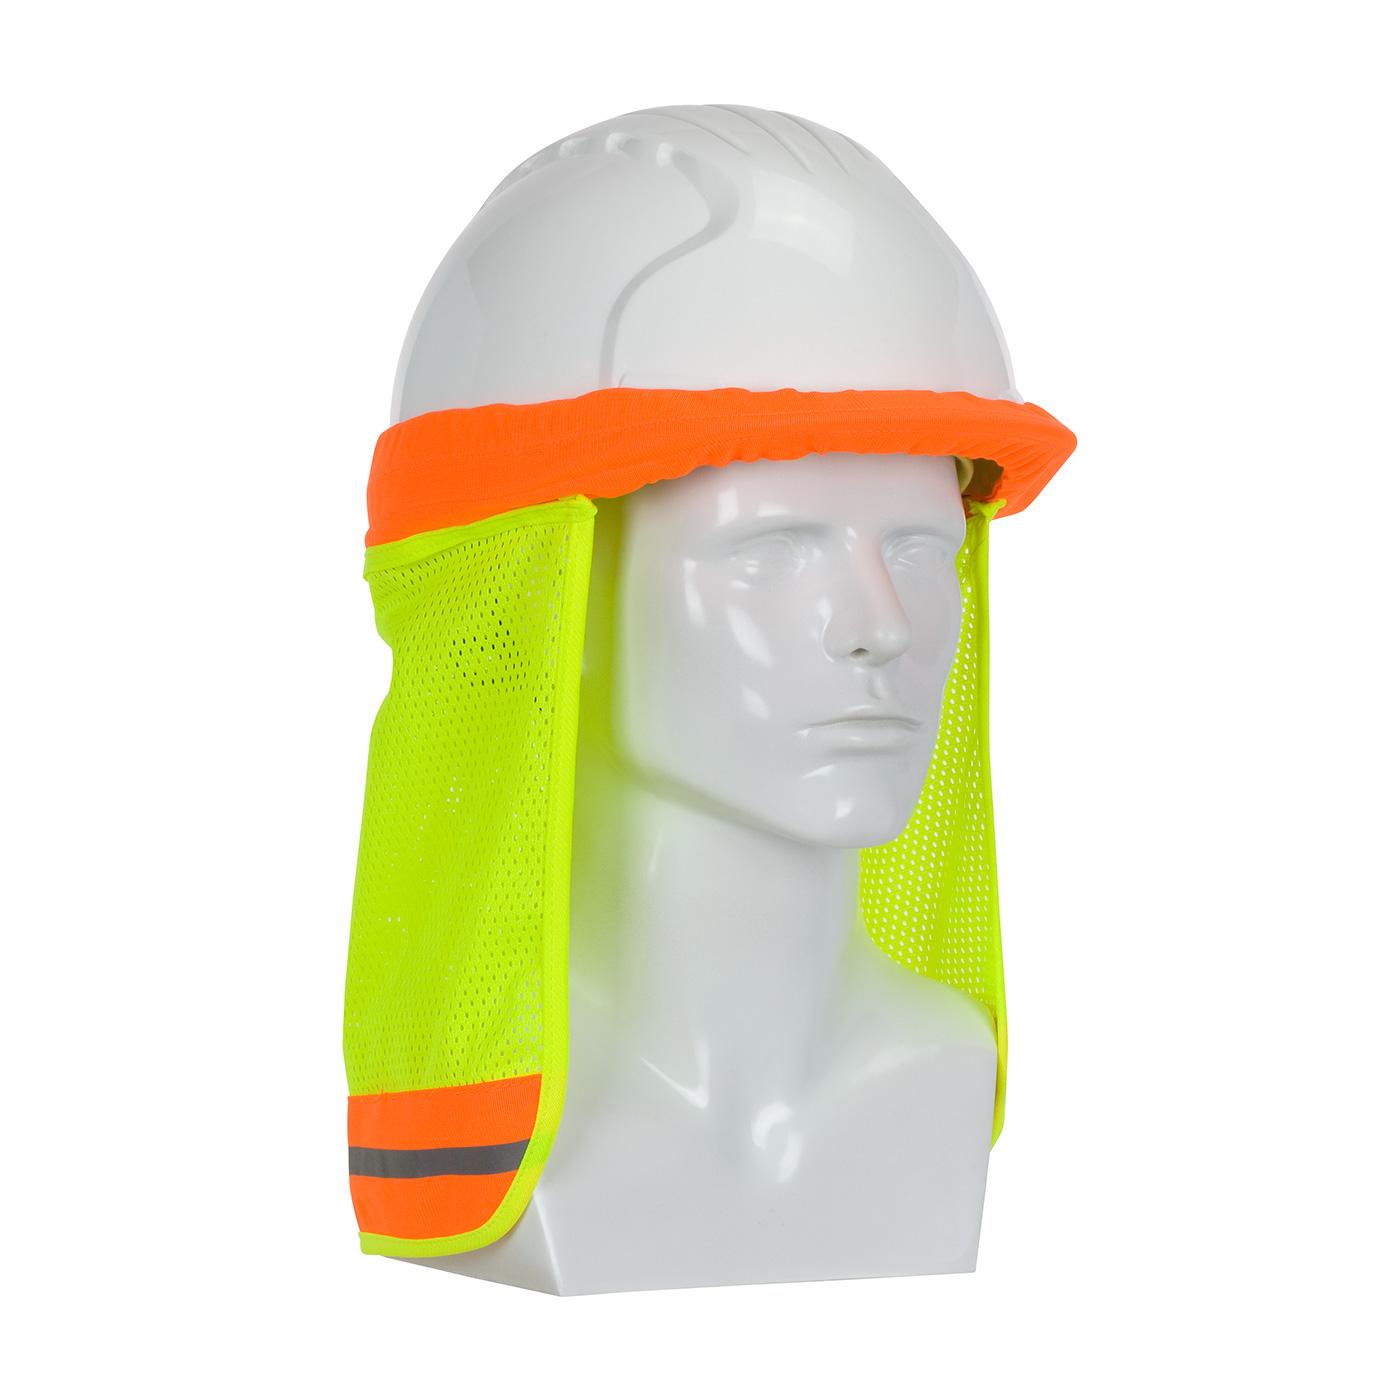 FR Treated Hi-Vis Hard Hat Neck Shade, Hi-Vis Yellow, OS